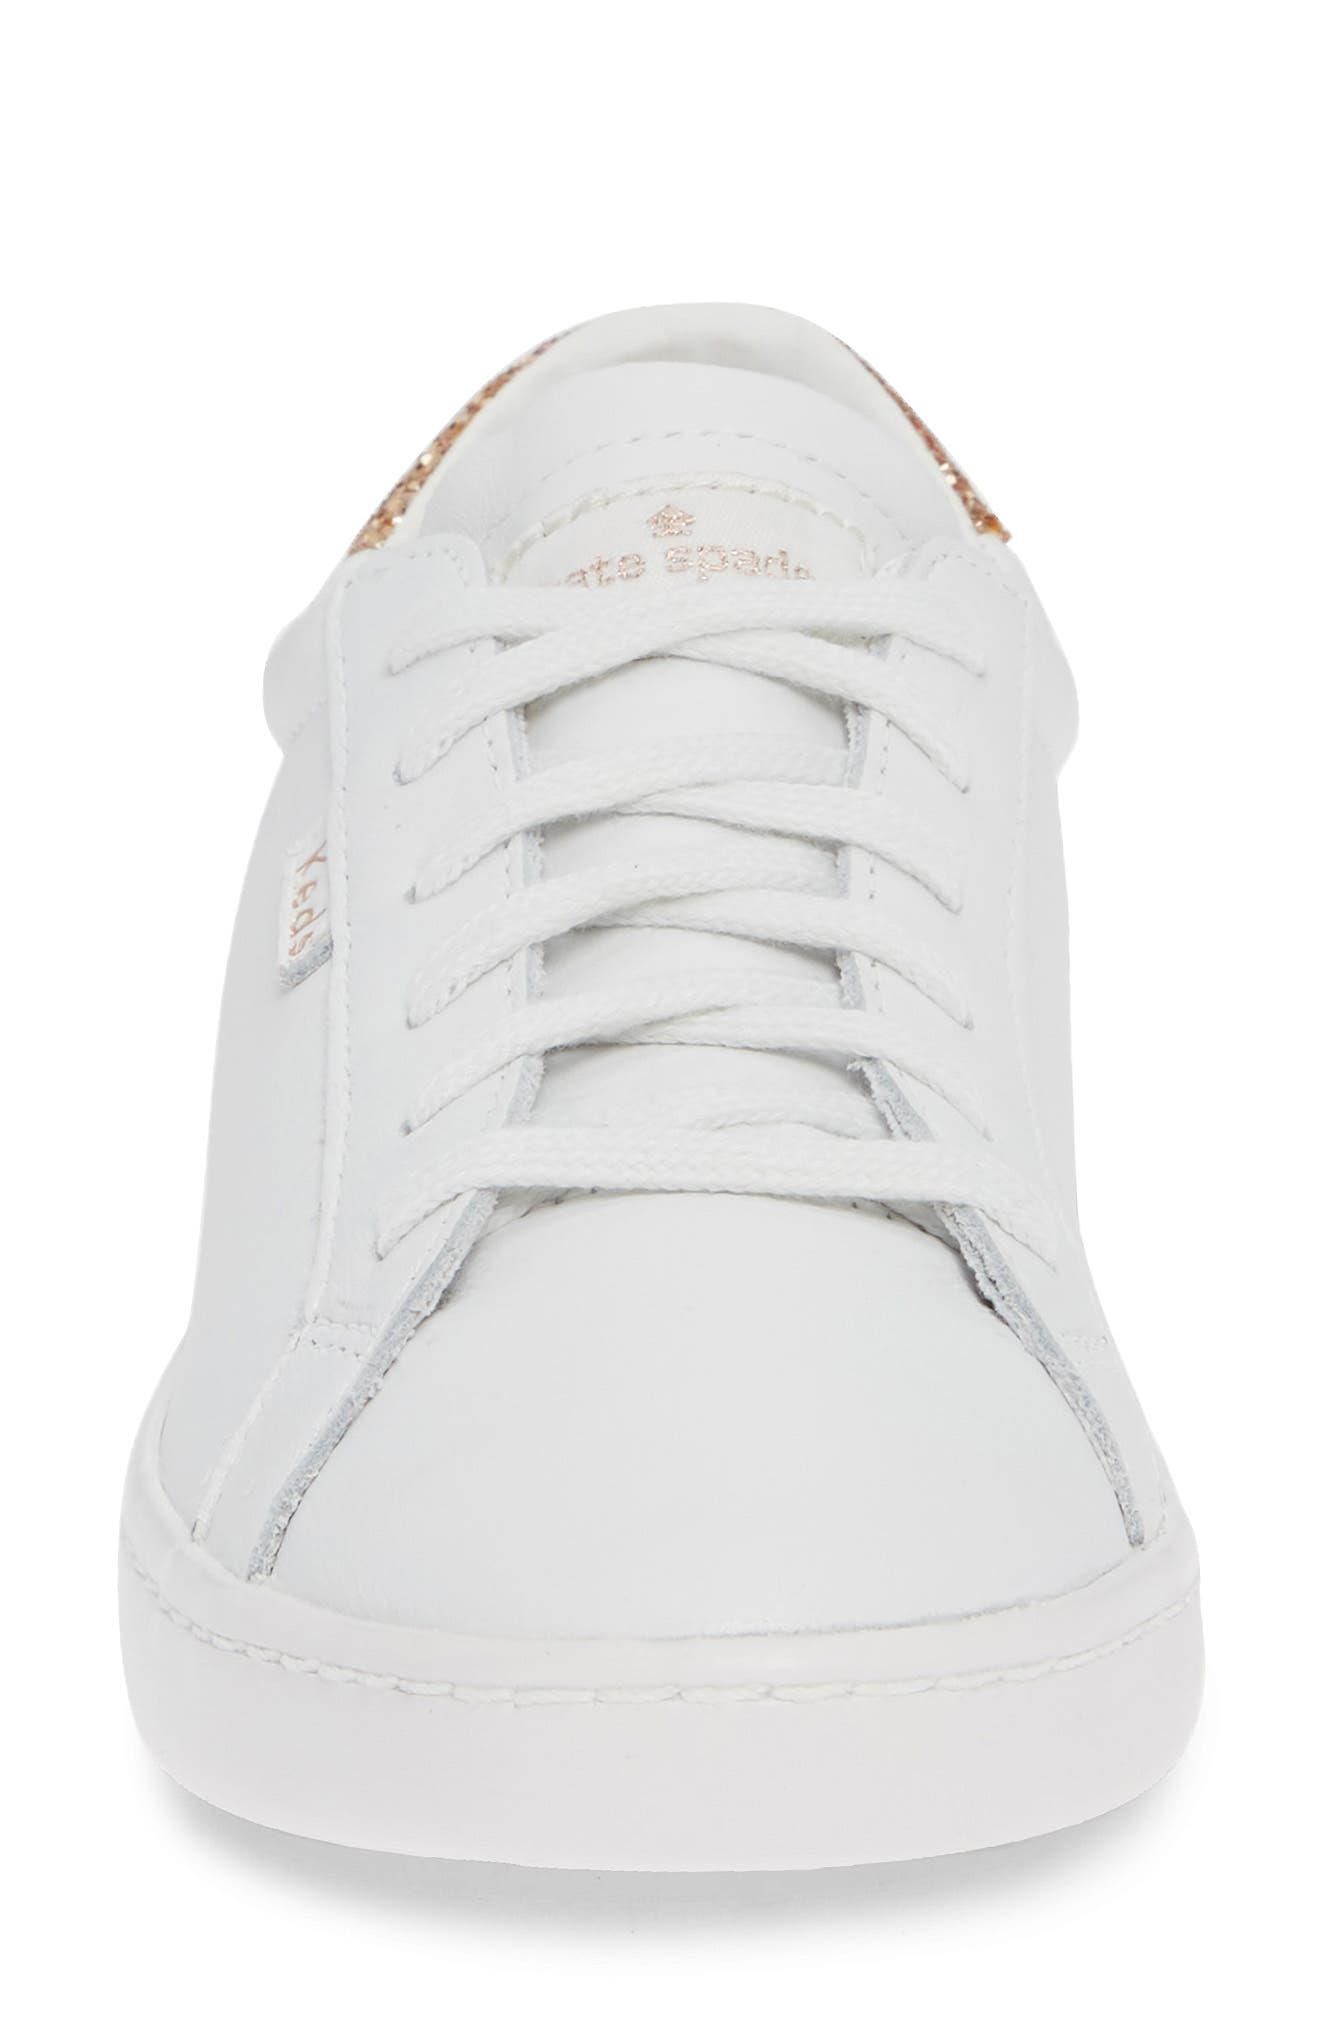 KEDS<SUP>®</SUP> FOR KATE SPADE NEW YORK, ace glitter sneaker, Alternate thumbnail 4, color, 100